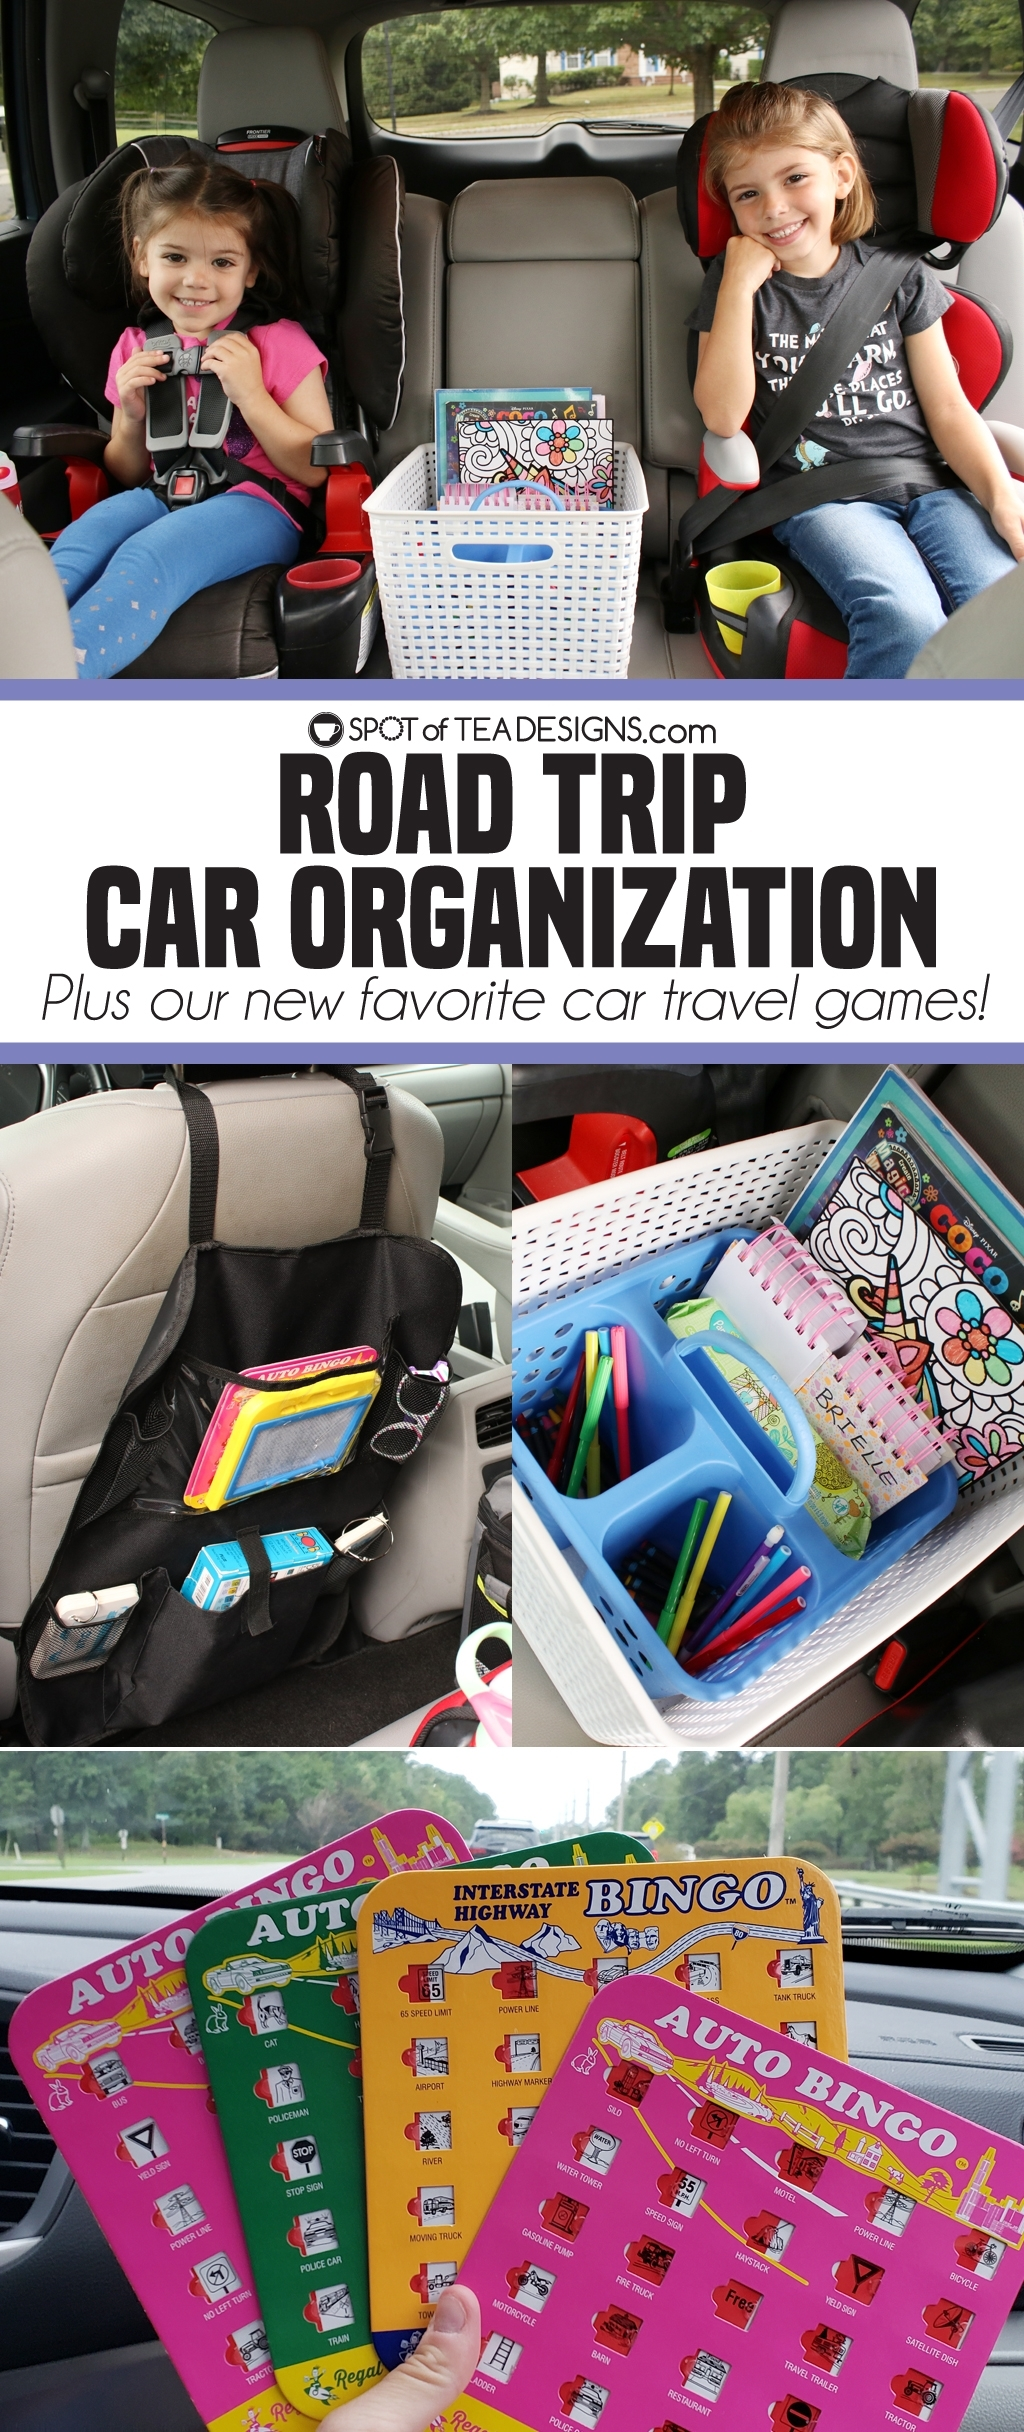 Road trip car organization - plus our new favorite car travel games! | spotofteadesigns.com